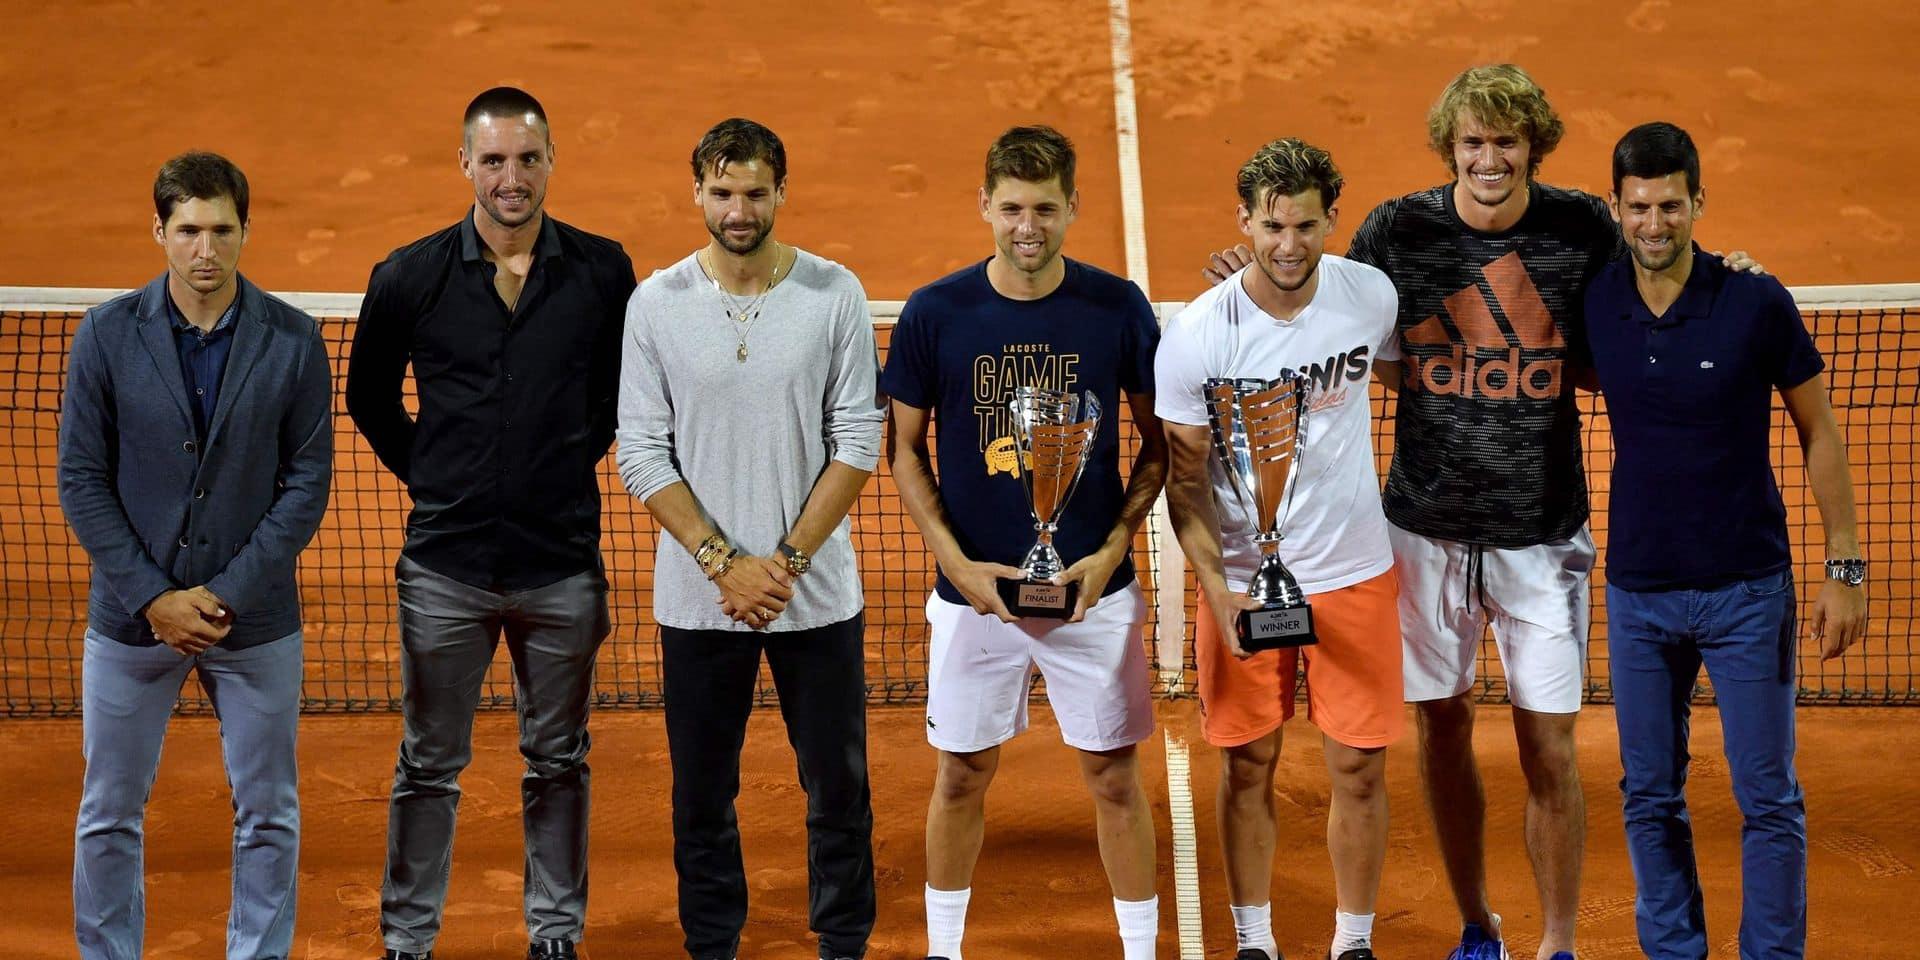 Tennis: Djokovic relance le tournoi de Belgrade après le fiasco de l'Adria tour